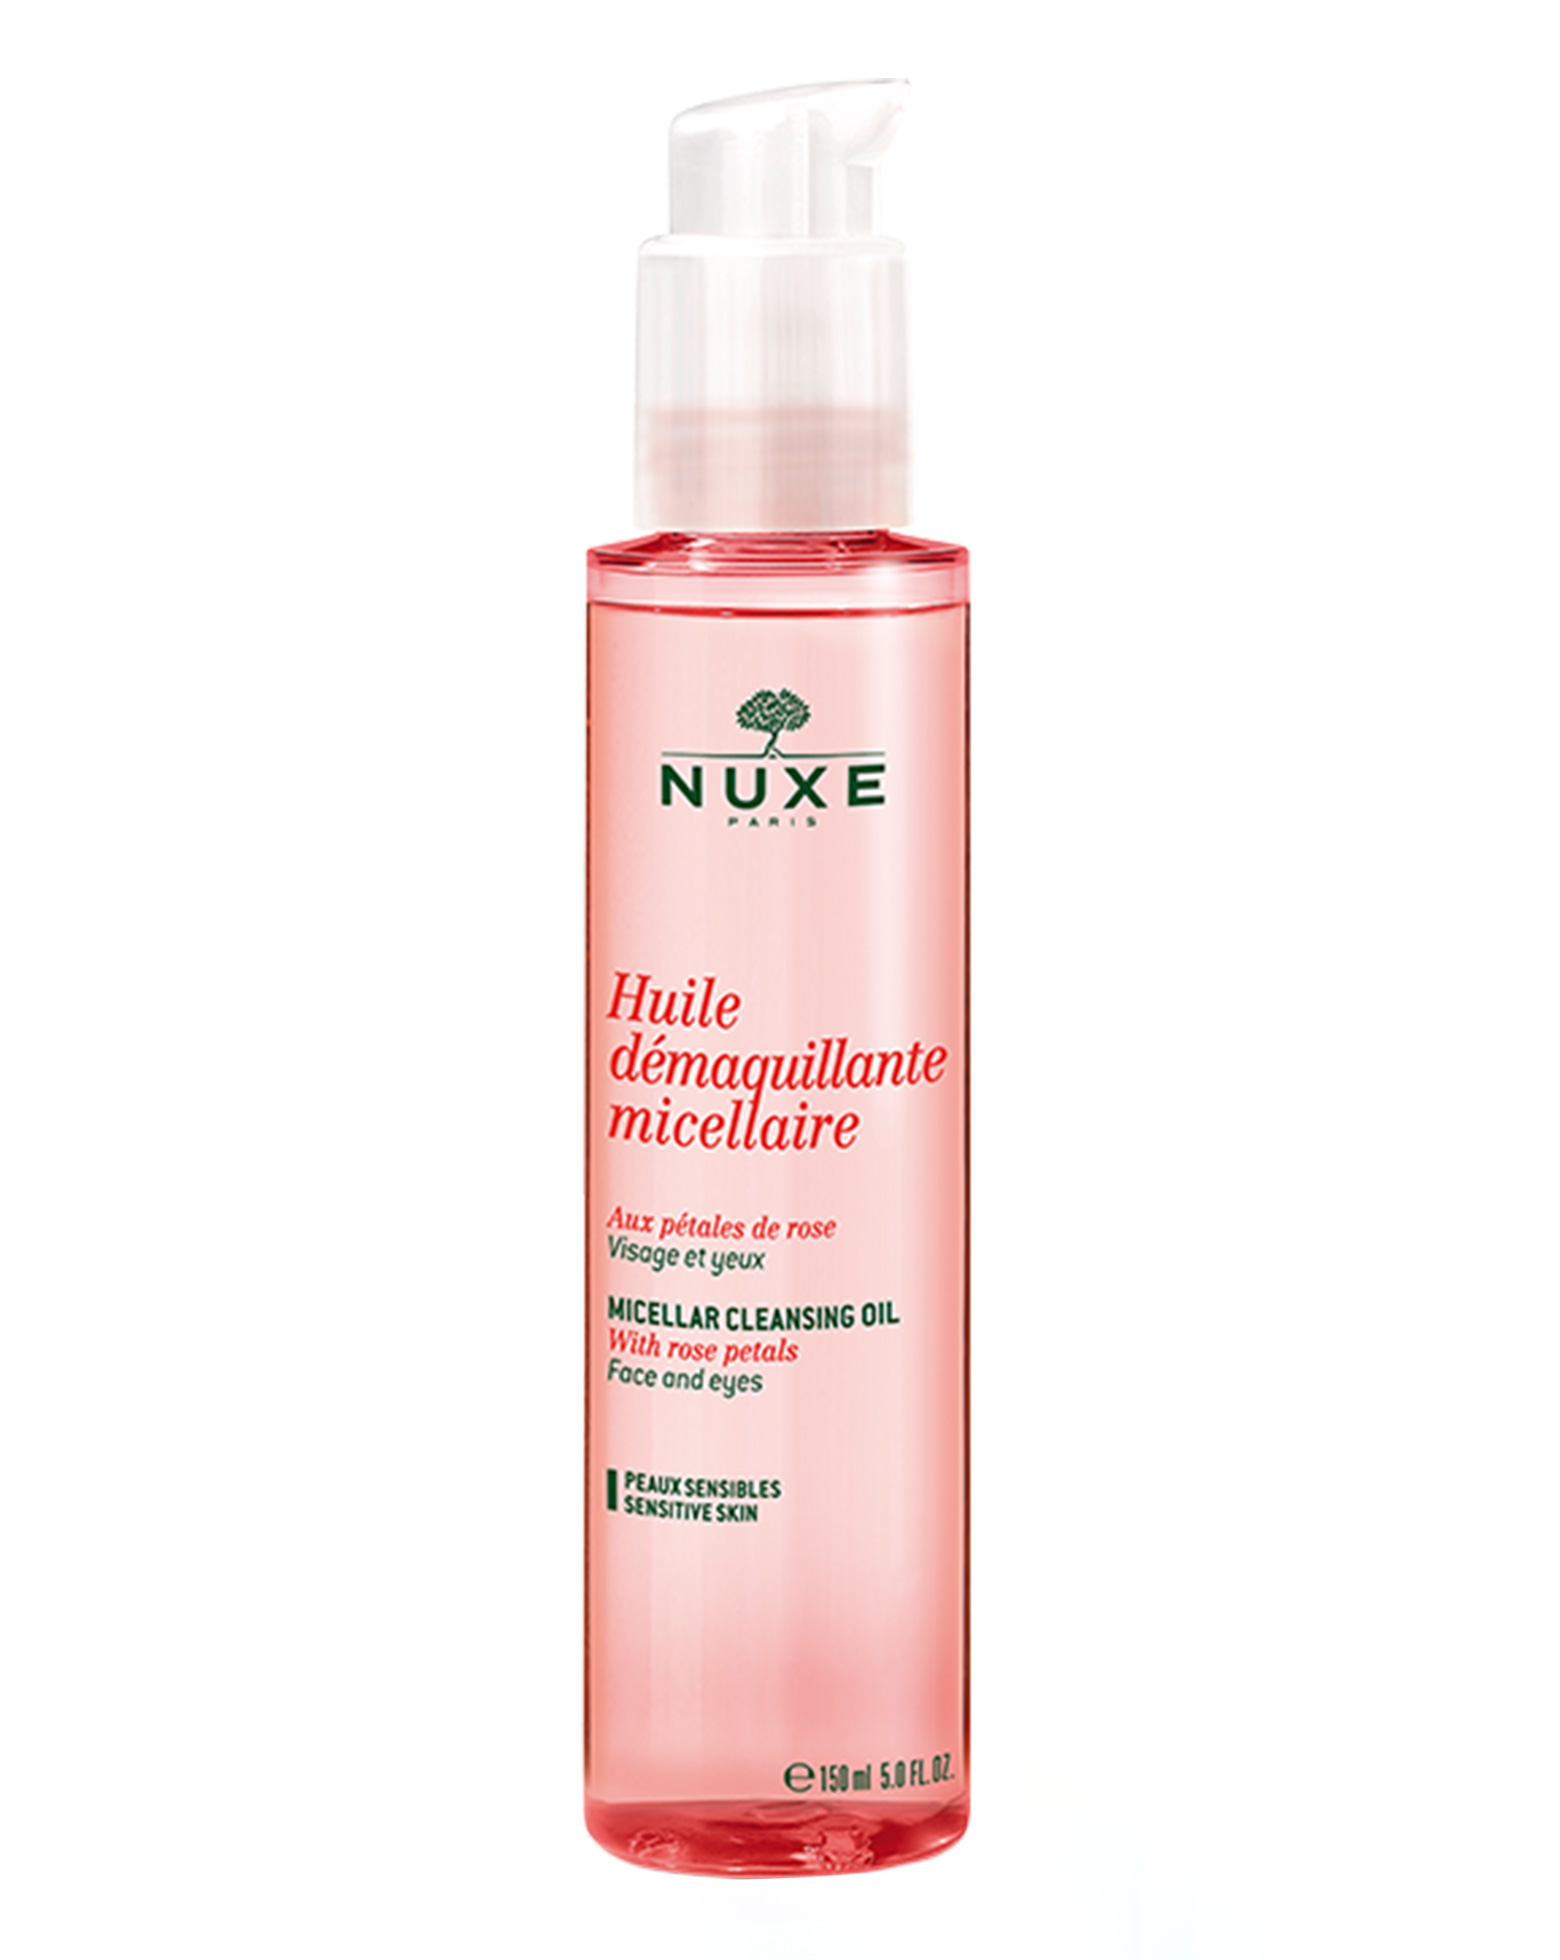 nux014_nuxe_micellercleansingoilwithrosepetals_1_1560x1960-1jdg7.jpg